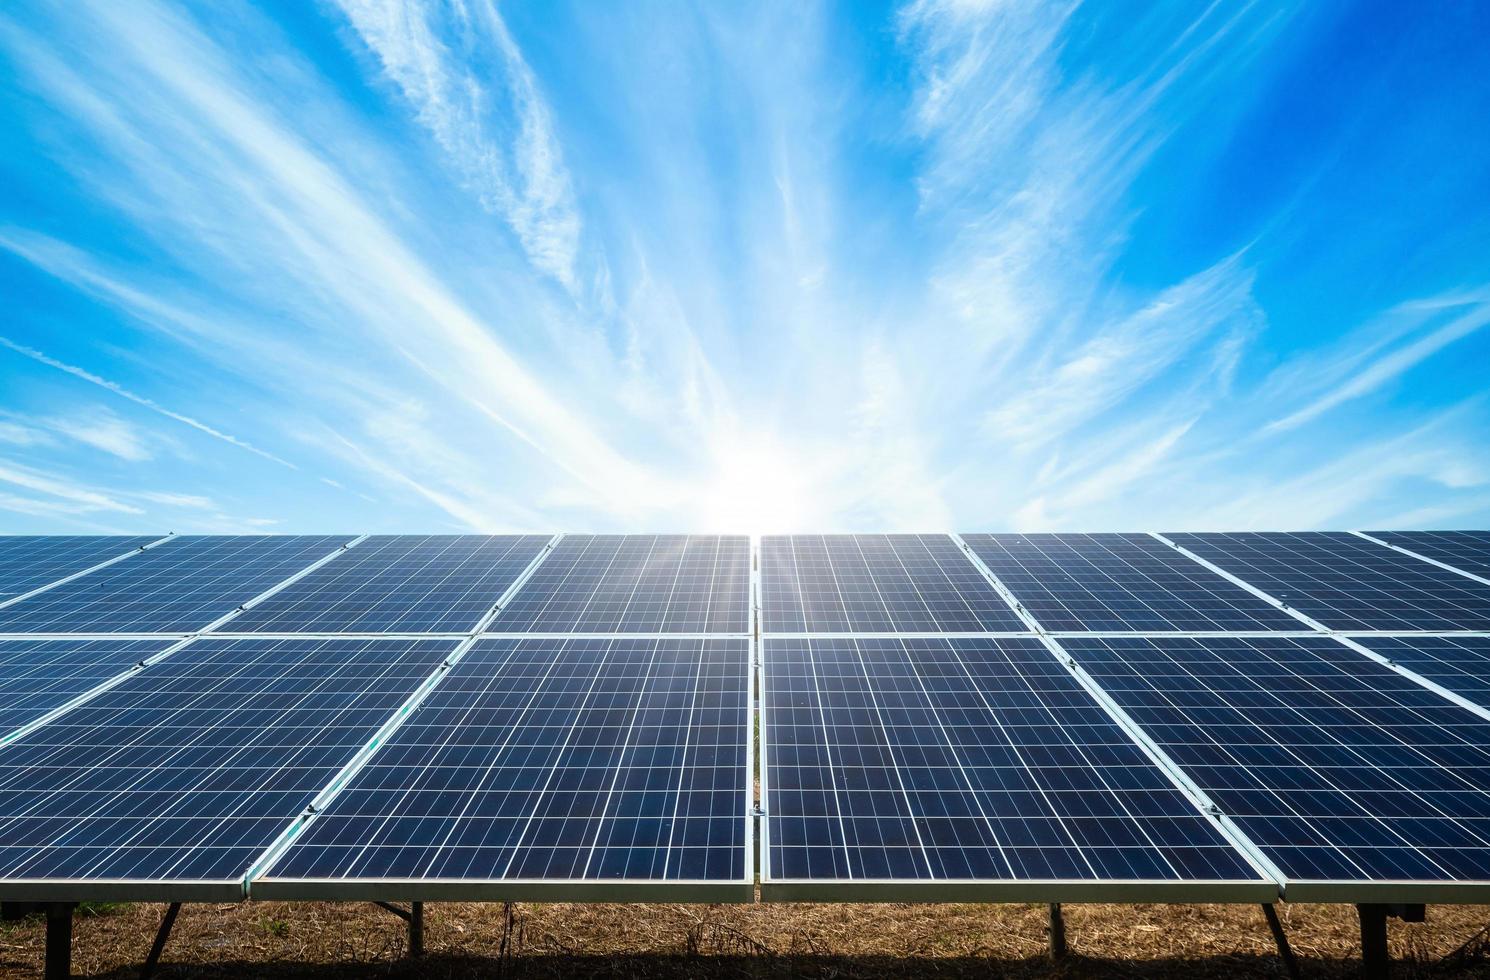 Solar panel on blue sky background photo